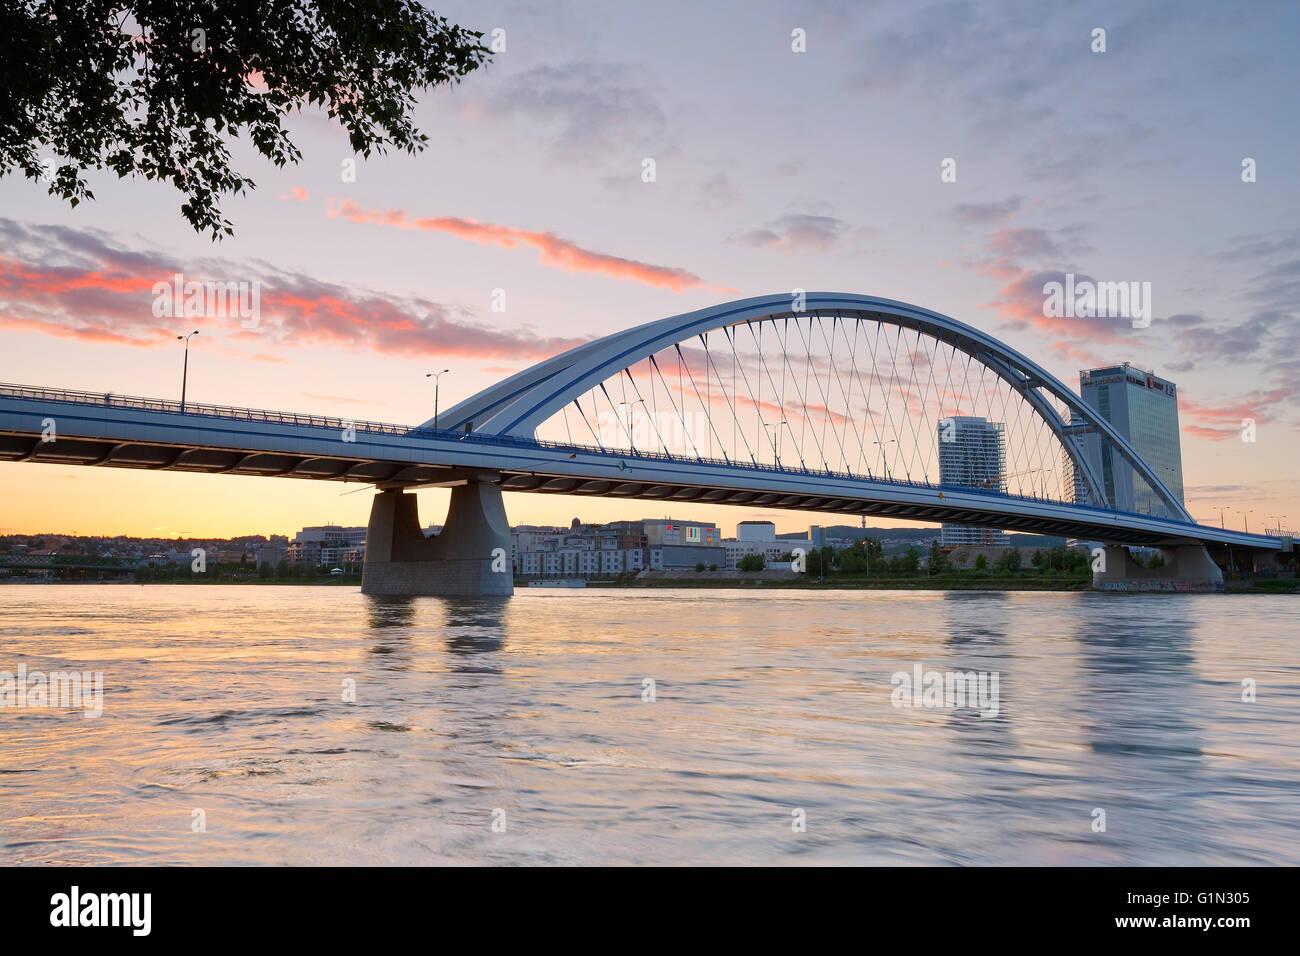 Apollo bridge over river Danube in Bratislava, Slovakia. Stock Photo